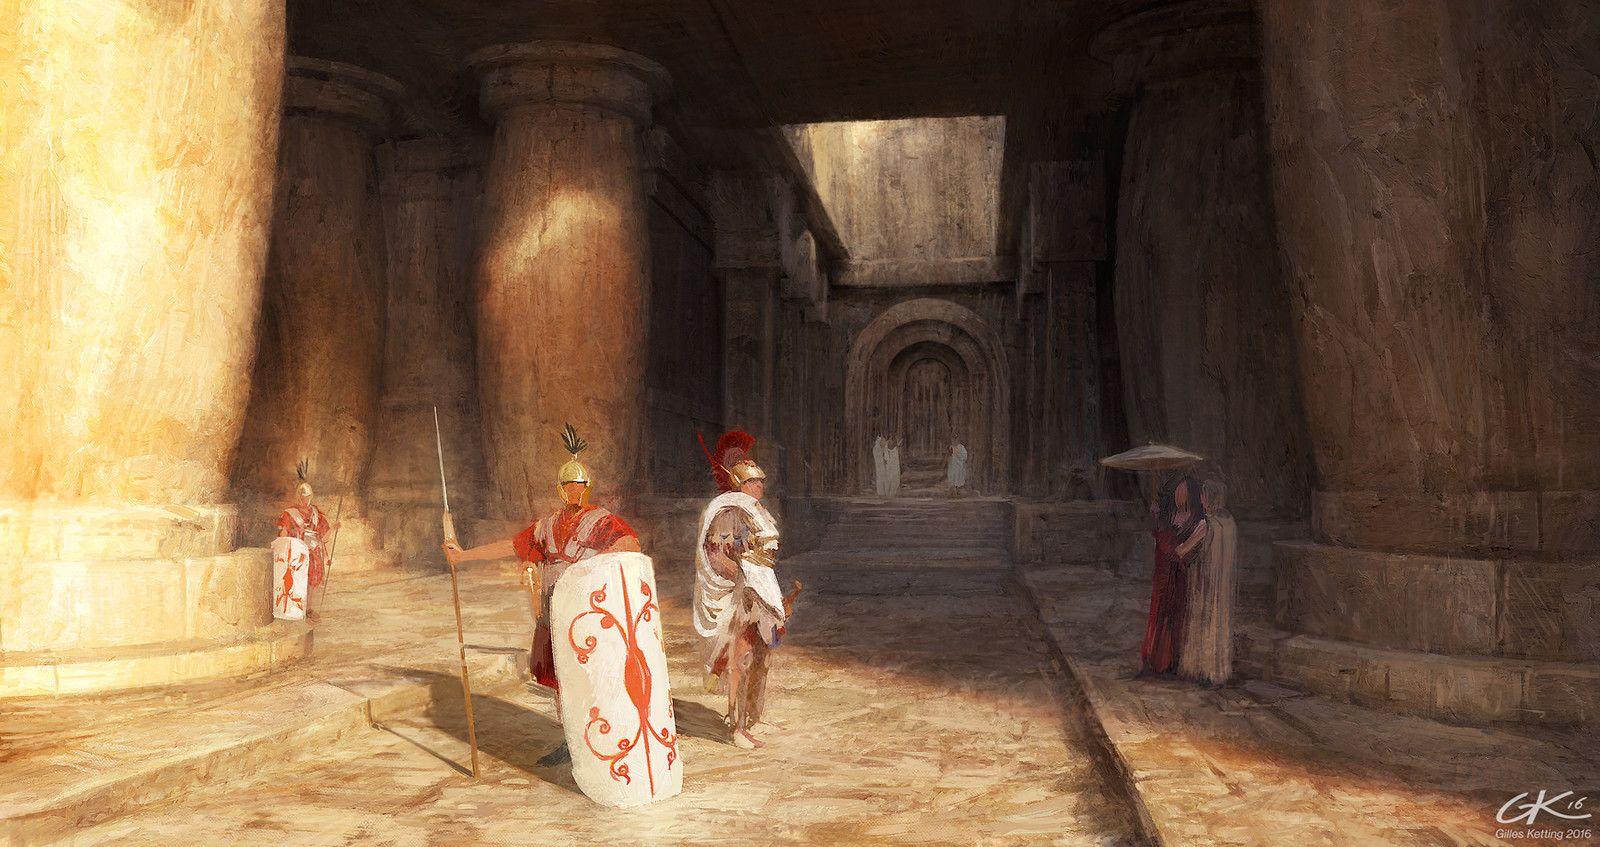 Visit to the southern ruins, Gilles Ketting on ArtStation at https://www.artstation.com/artwork/4R1Jn